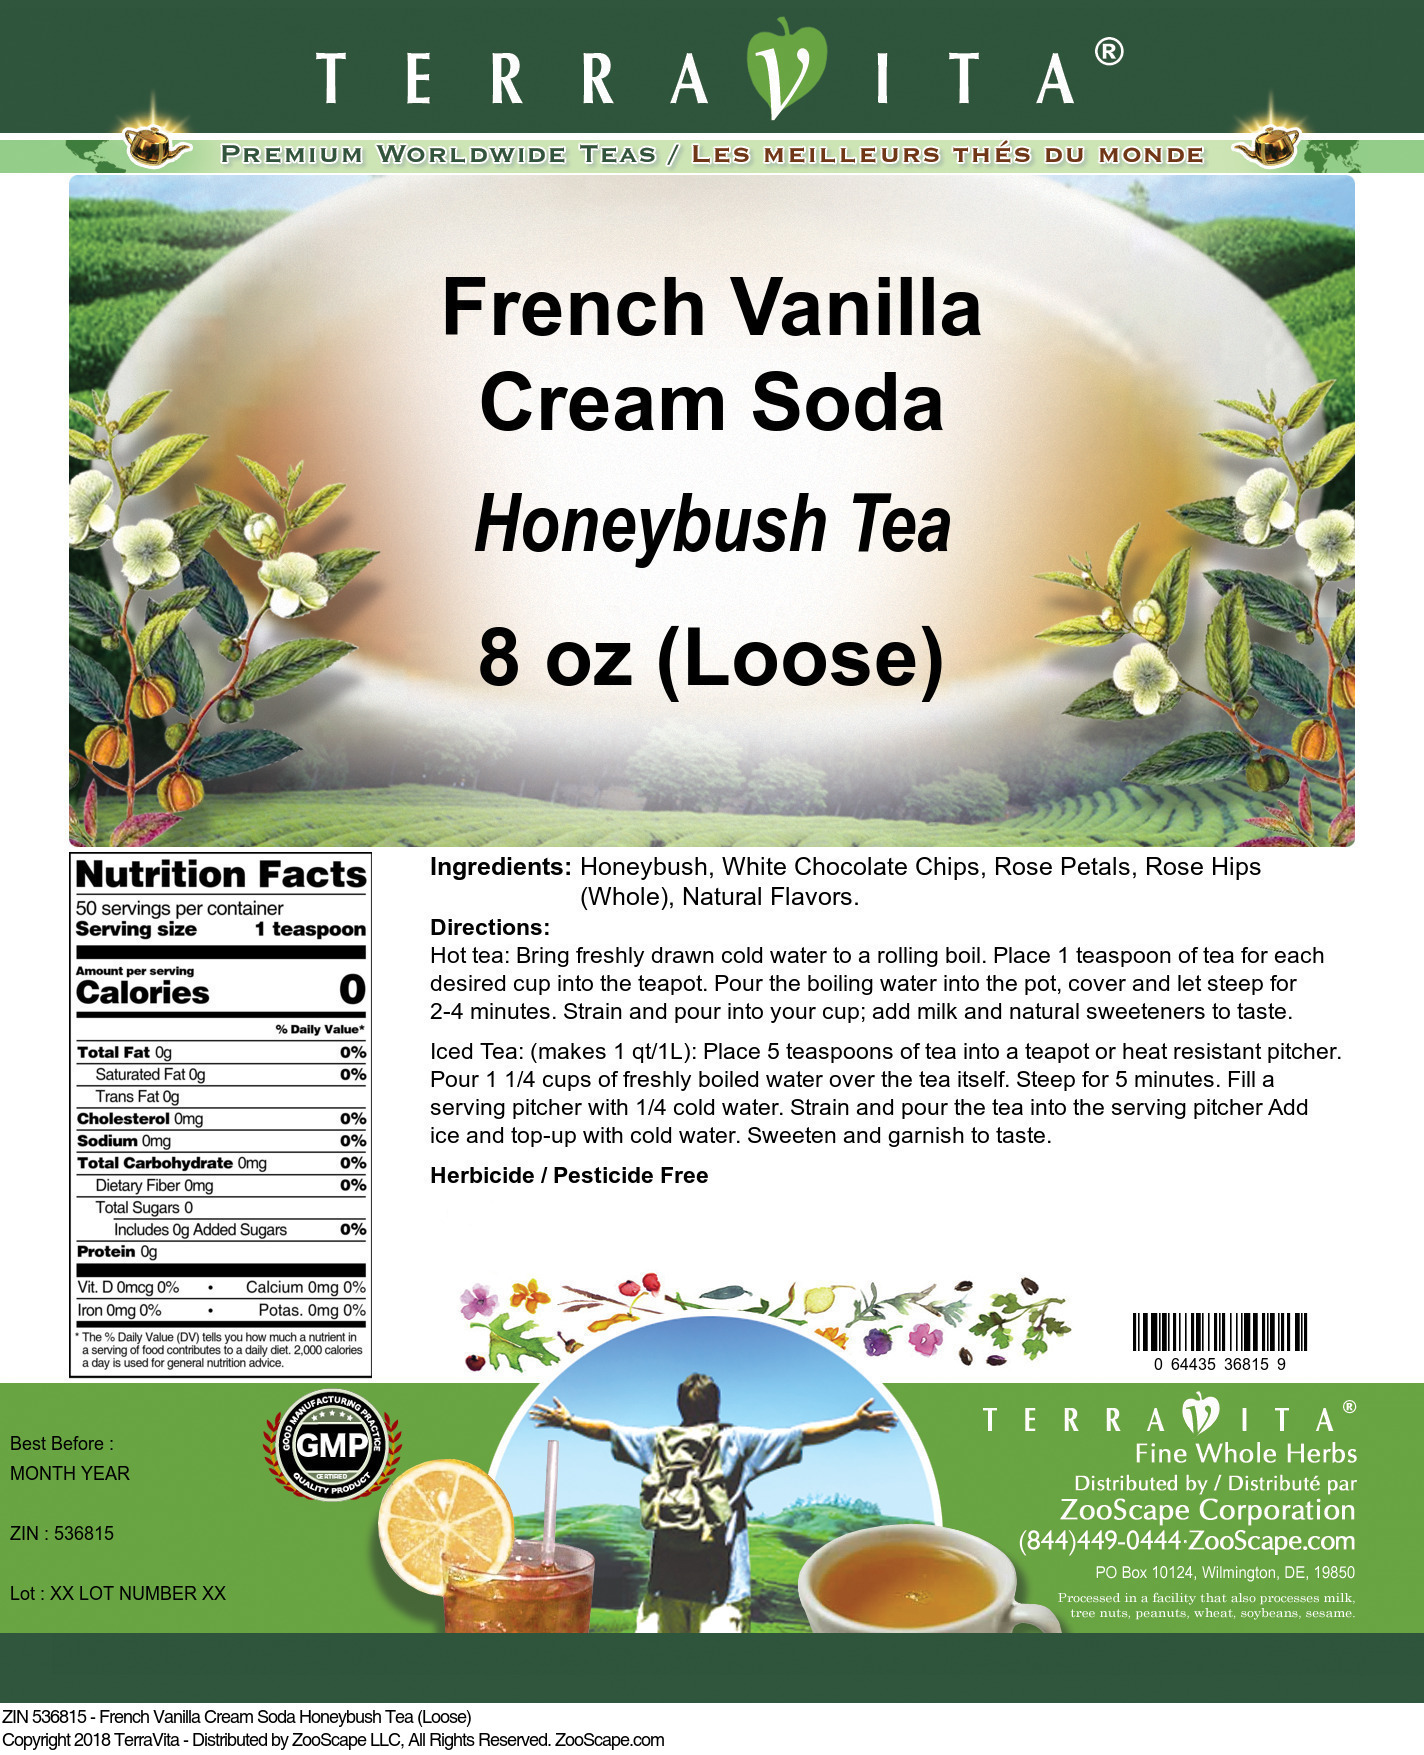 French Vanilla Cream Soda Honeybush Tea